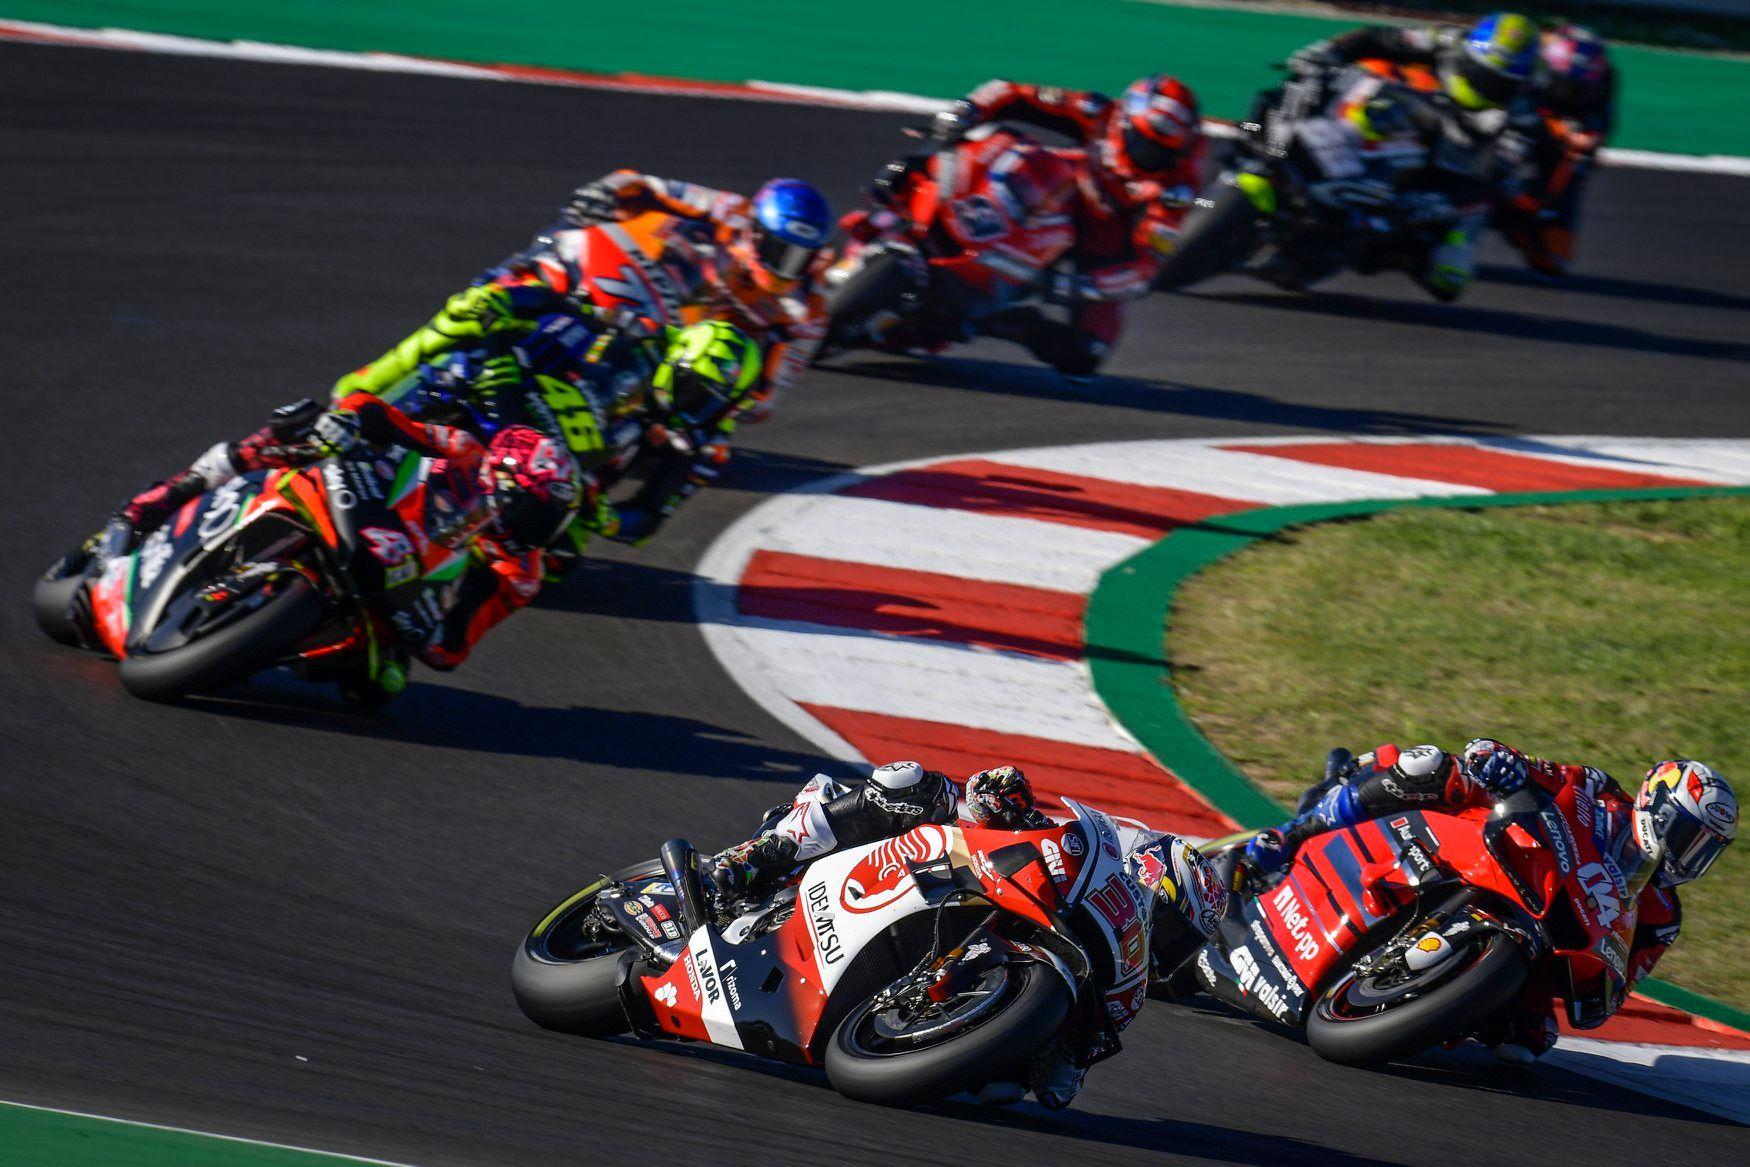 MotoGP riders prepare their season on karts!